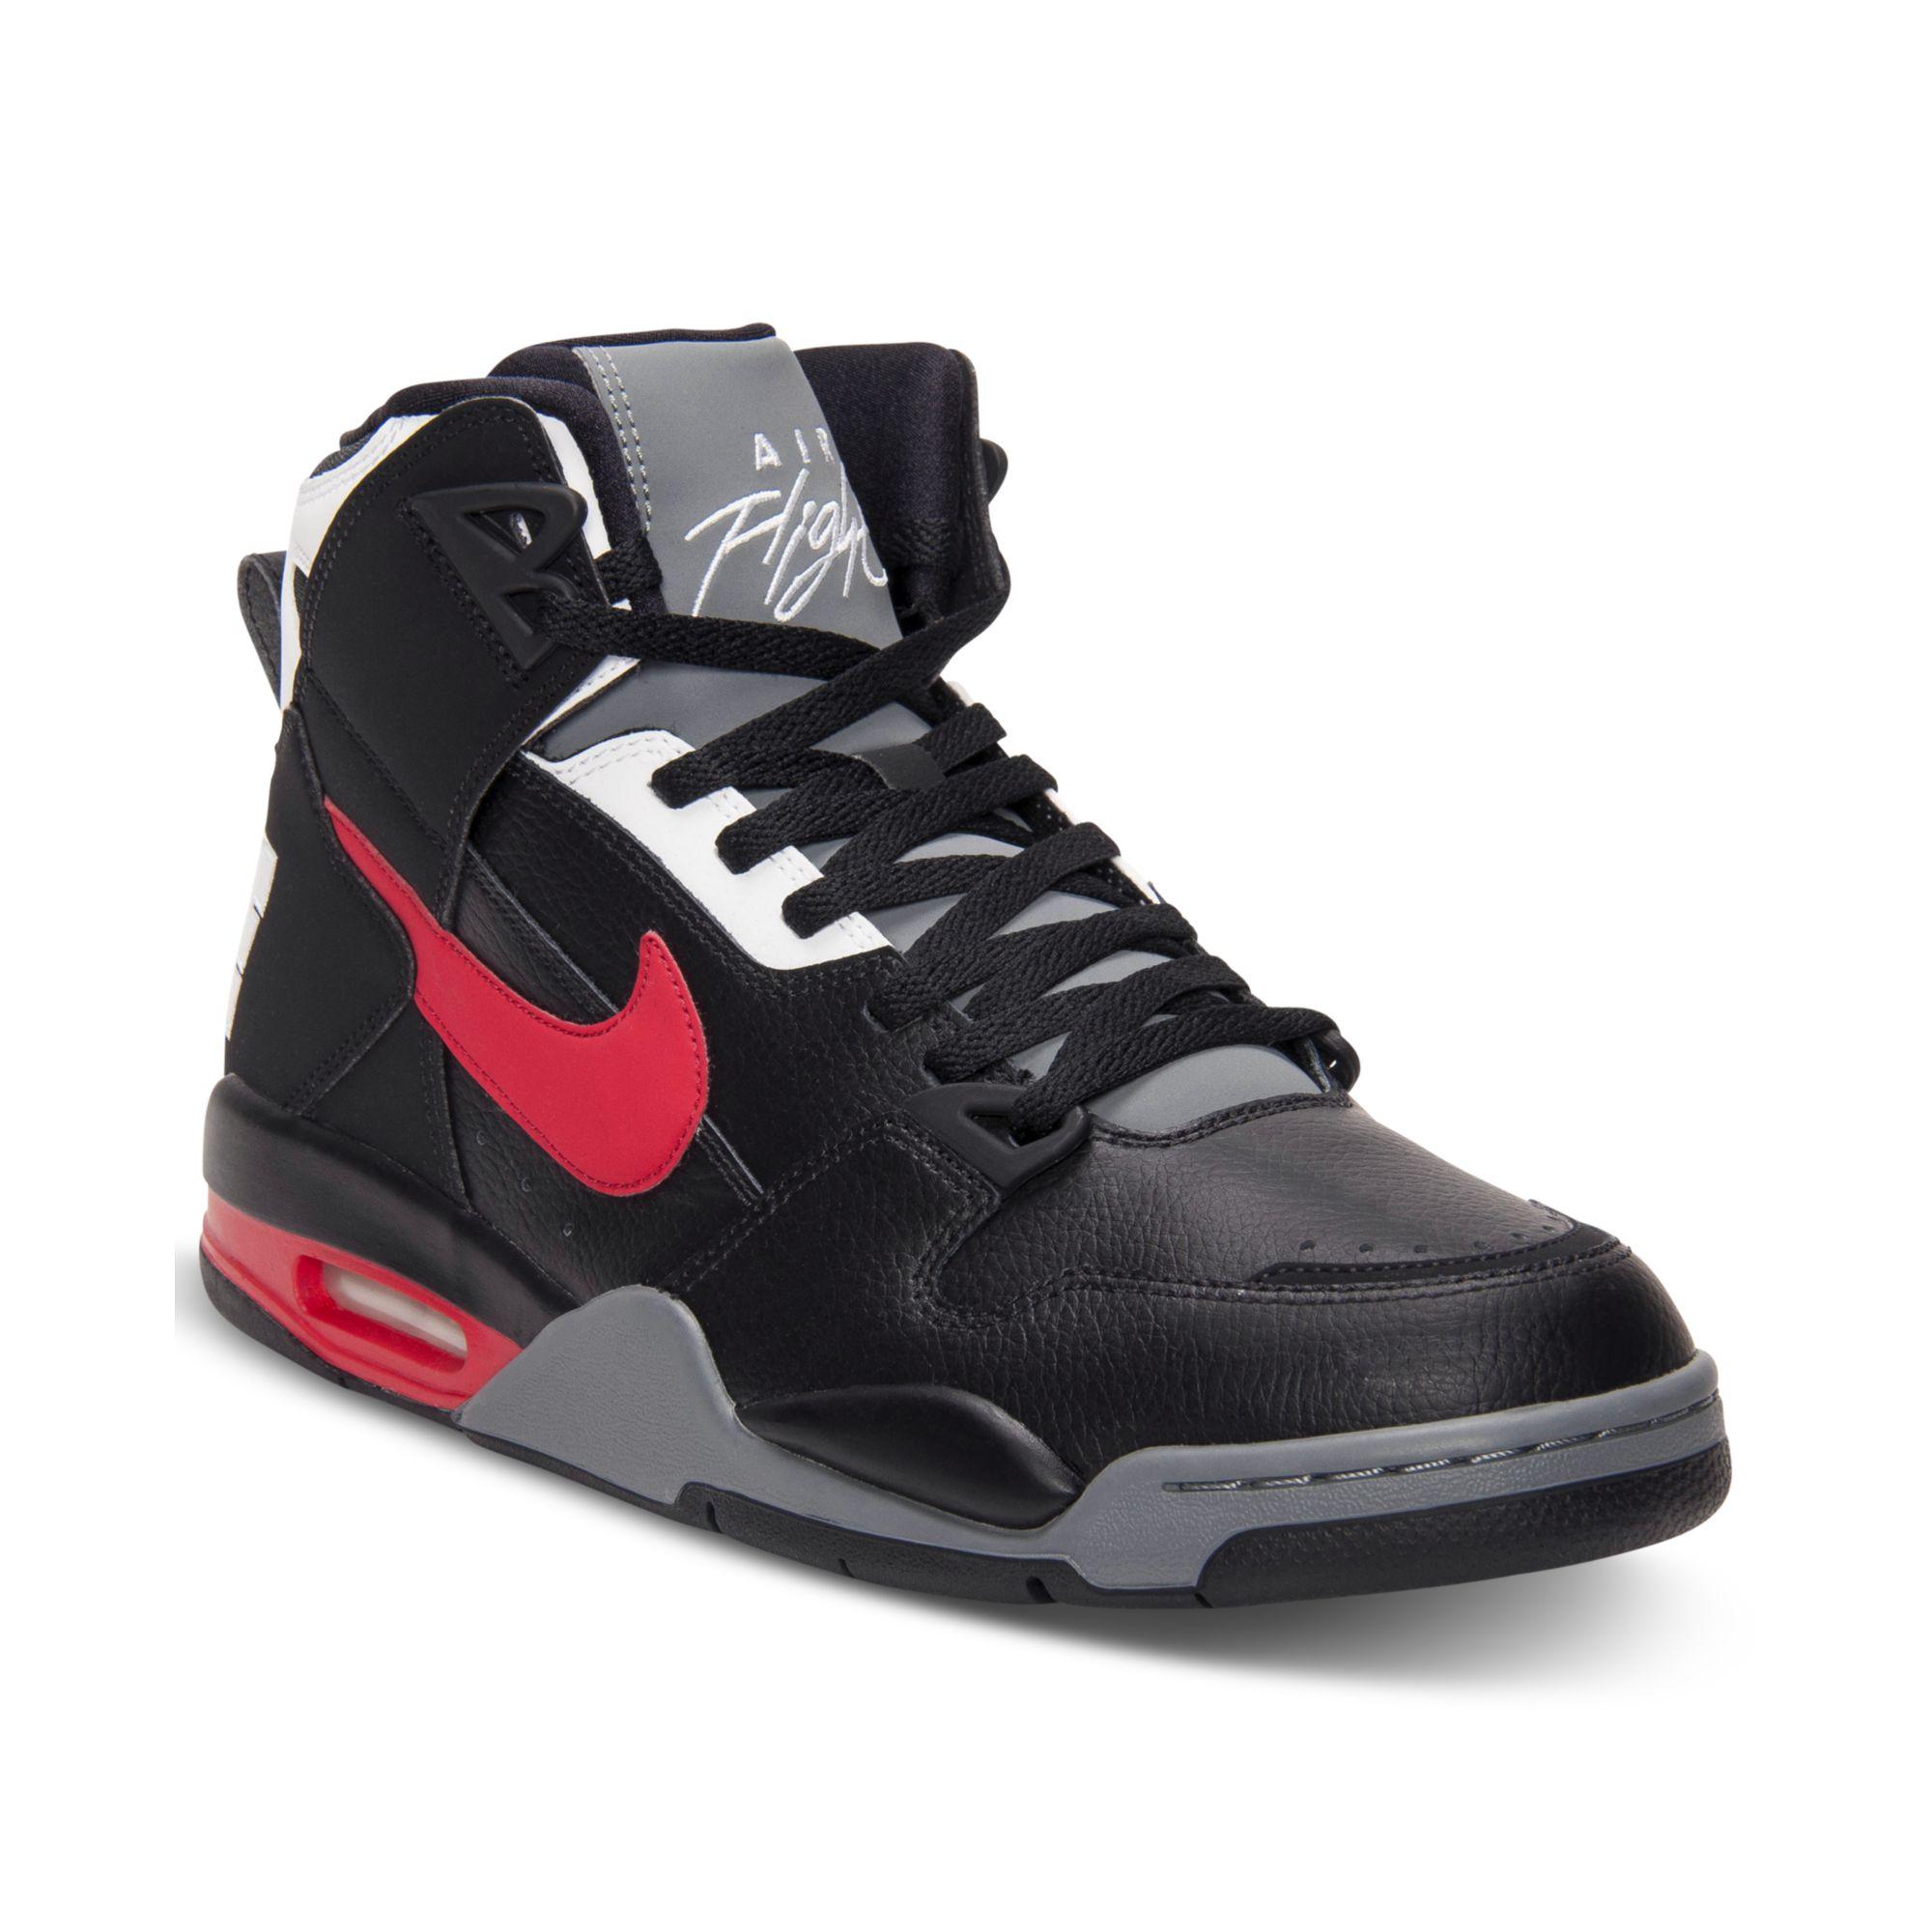 lyst nike air flight condor high basketball sneakers in